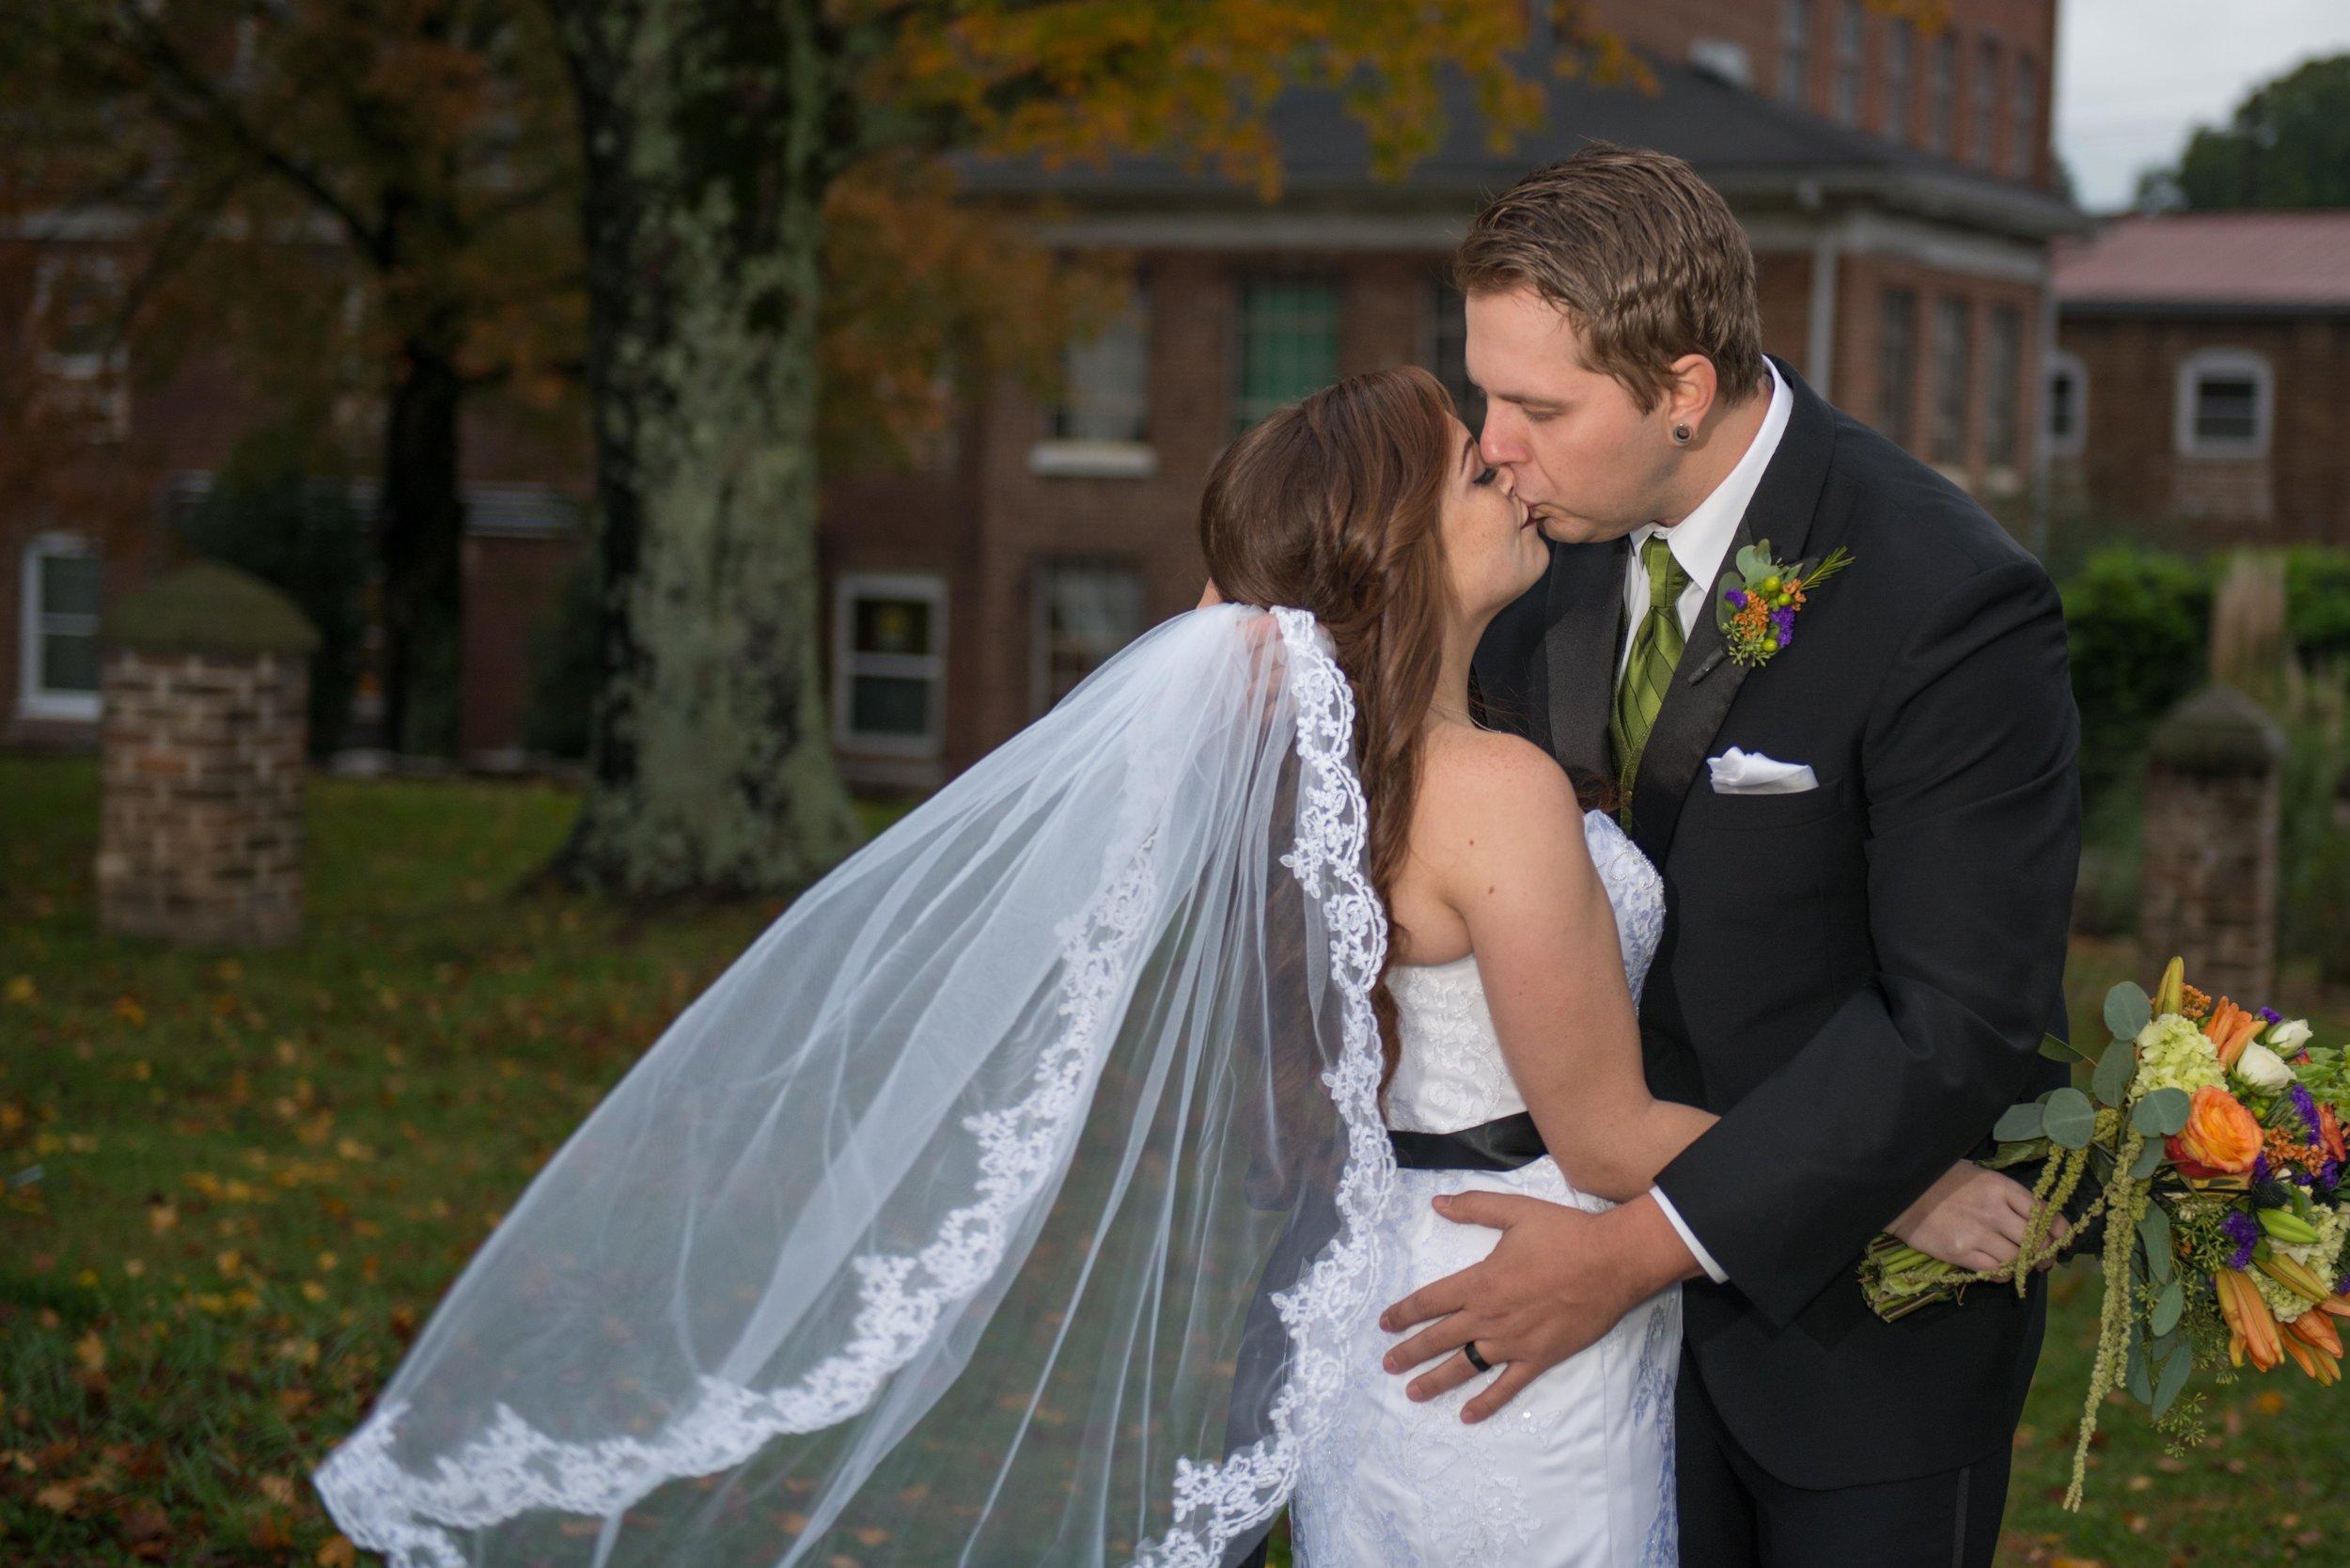 00001_Parker-Wedding-Sp-72.jpg